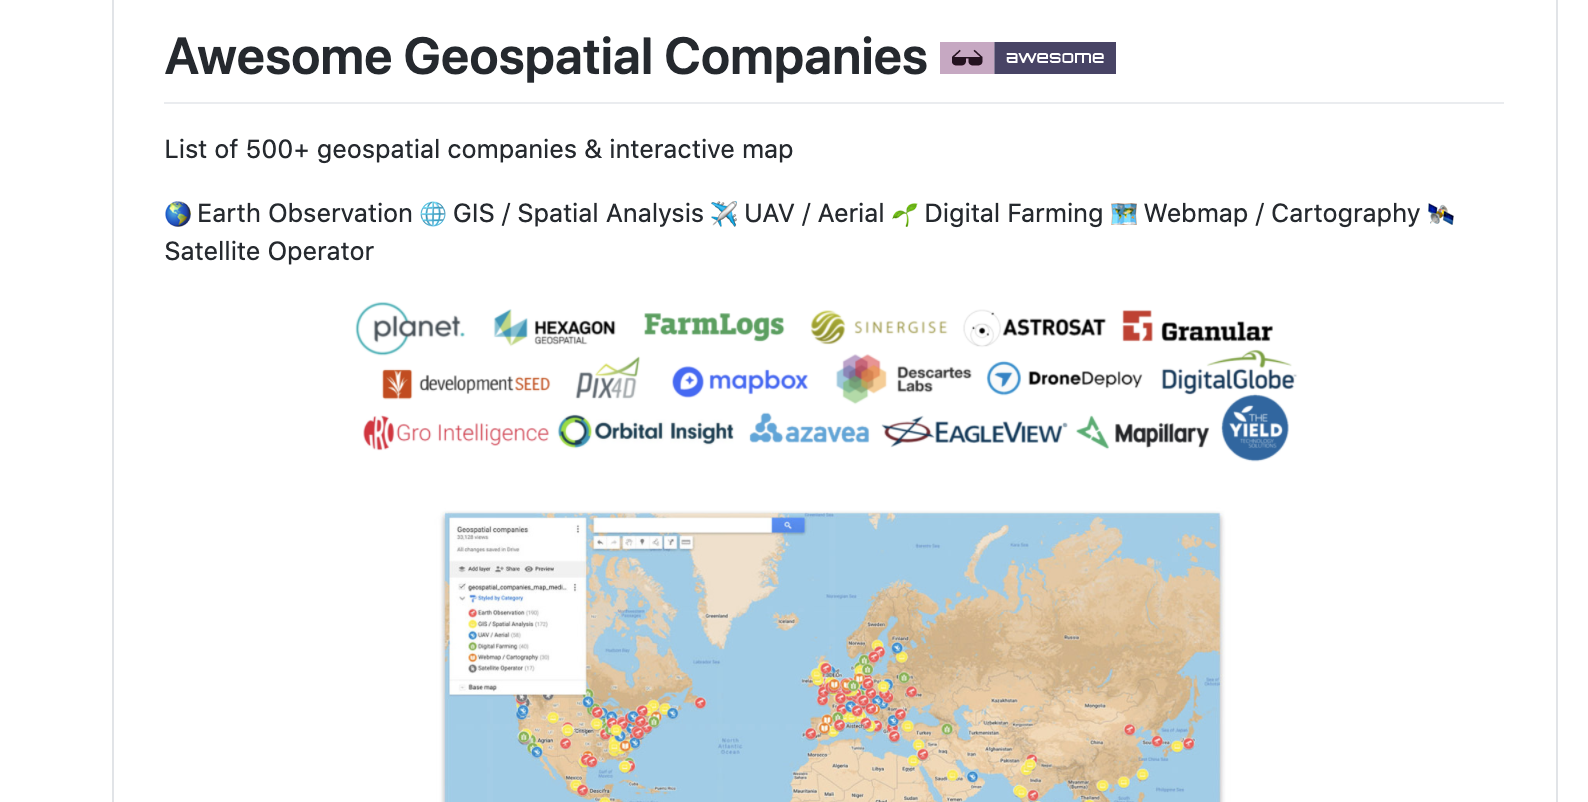 awesome-geospatial-companies